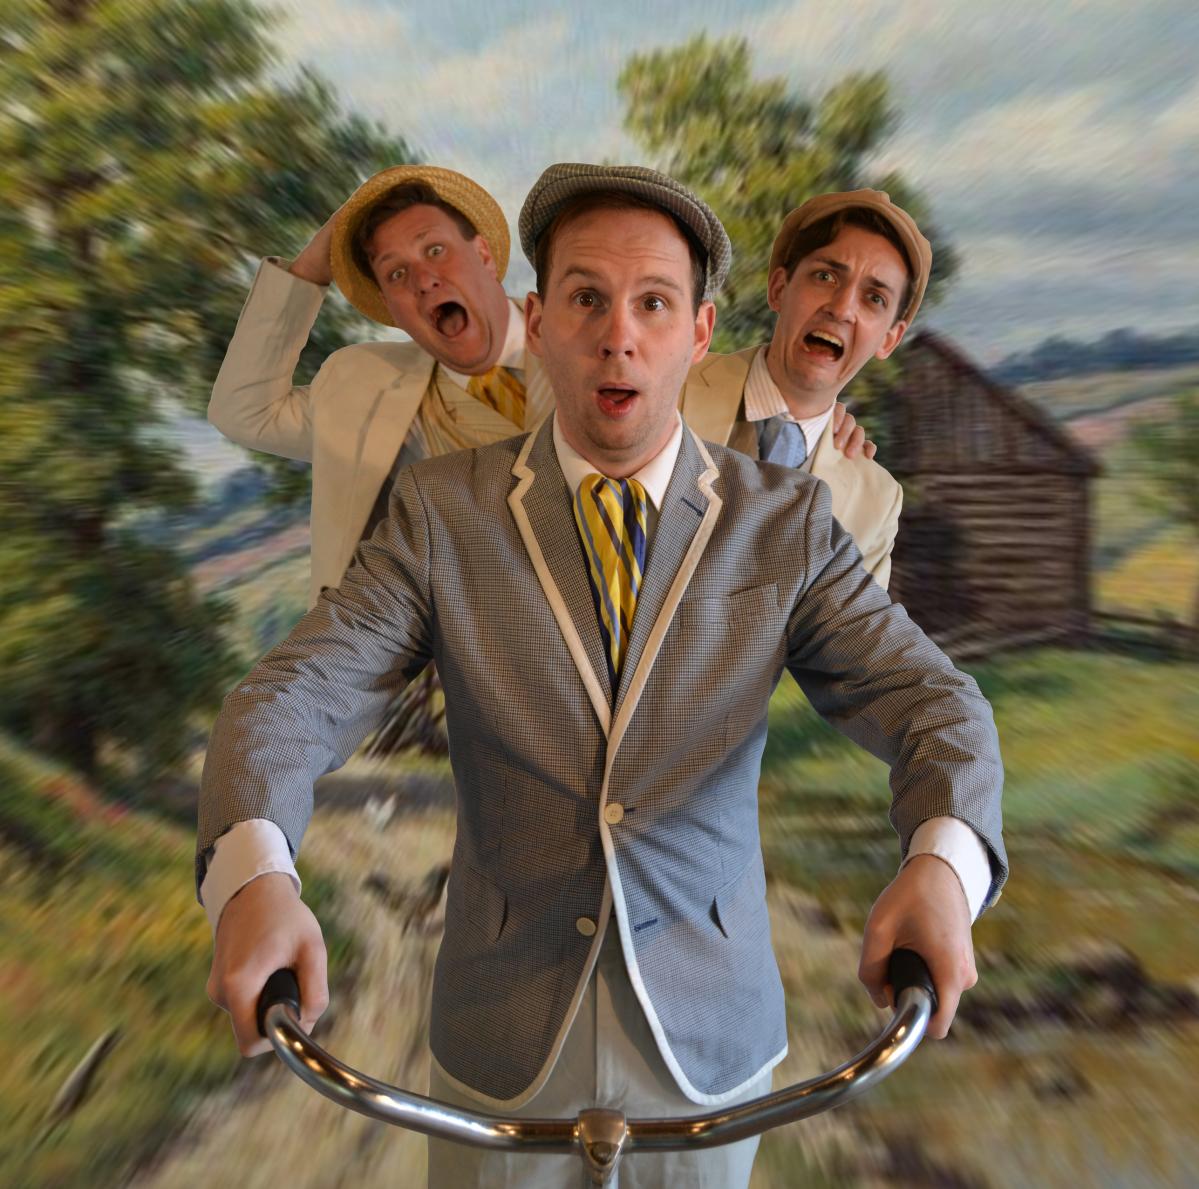 Toronto Fringe: Victorian bicycle tour shenanigans in the hilarious, entertaining Three Men on aBike